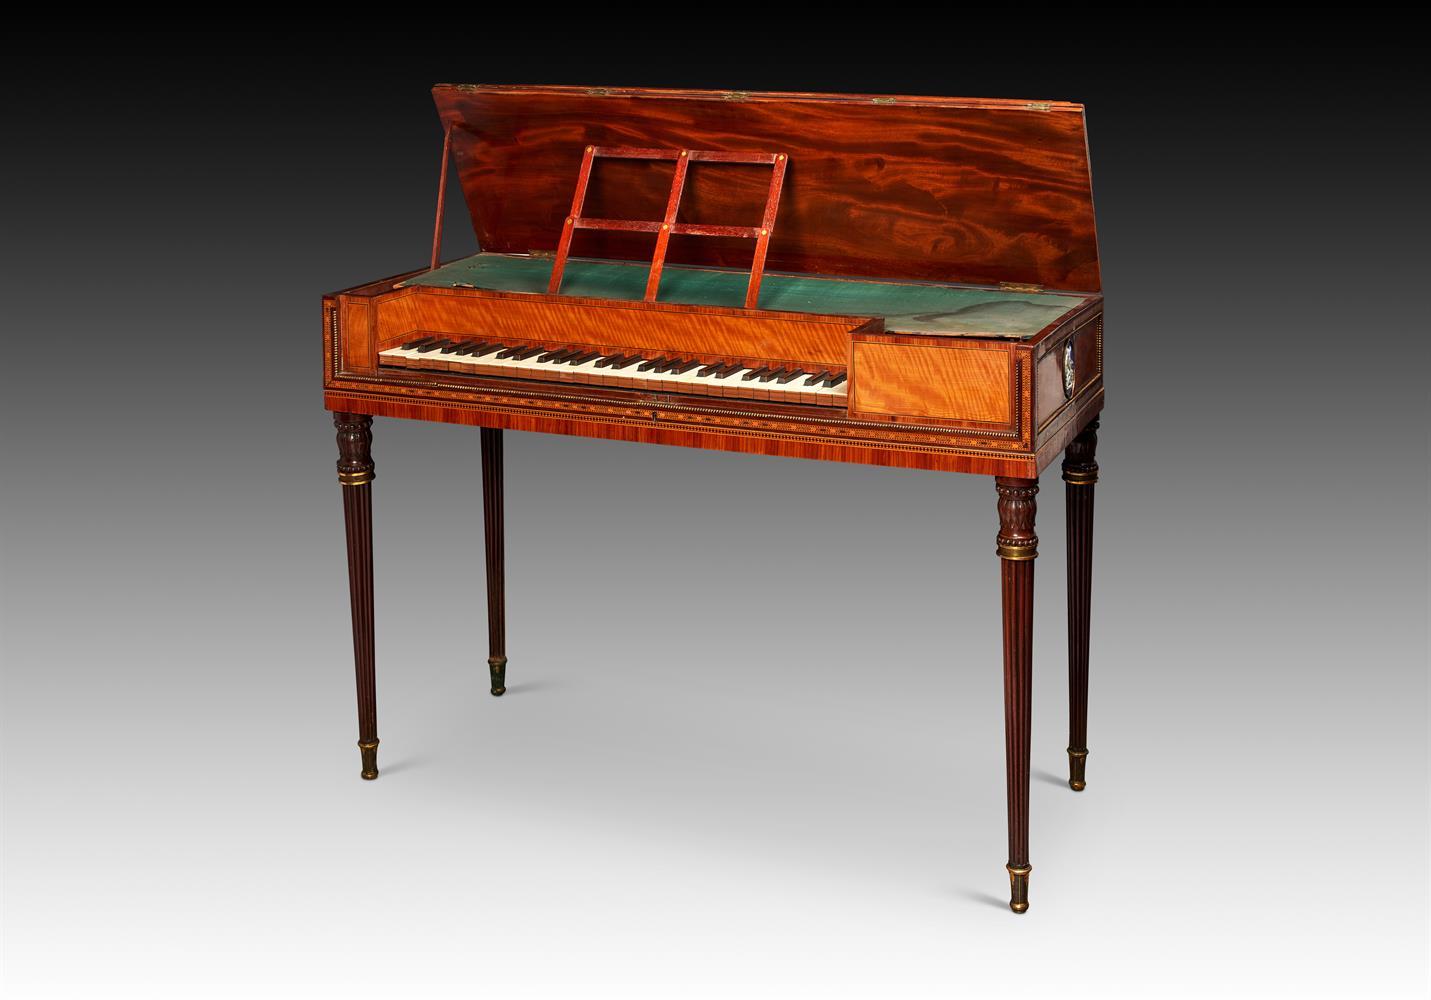 Y† AN ENGLISH SQUARE PIANO, CIRCA 1795